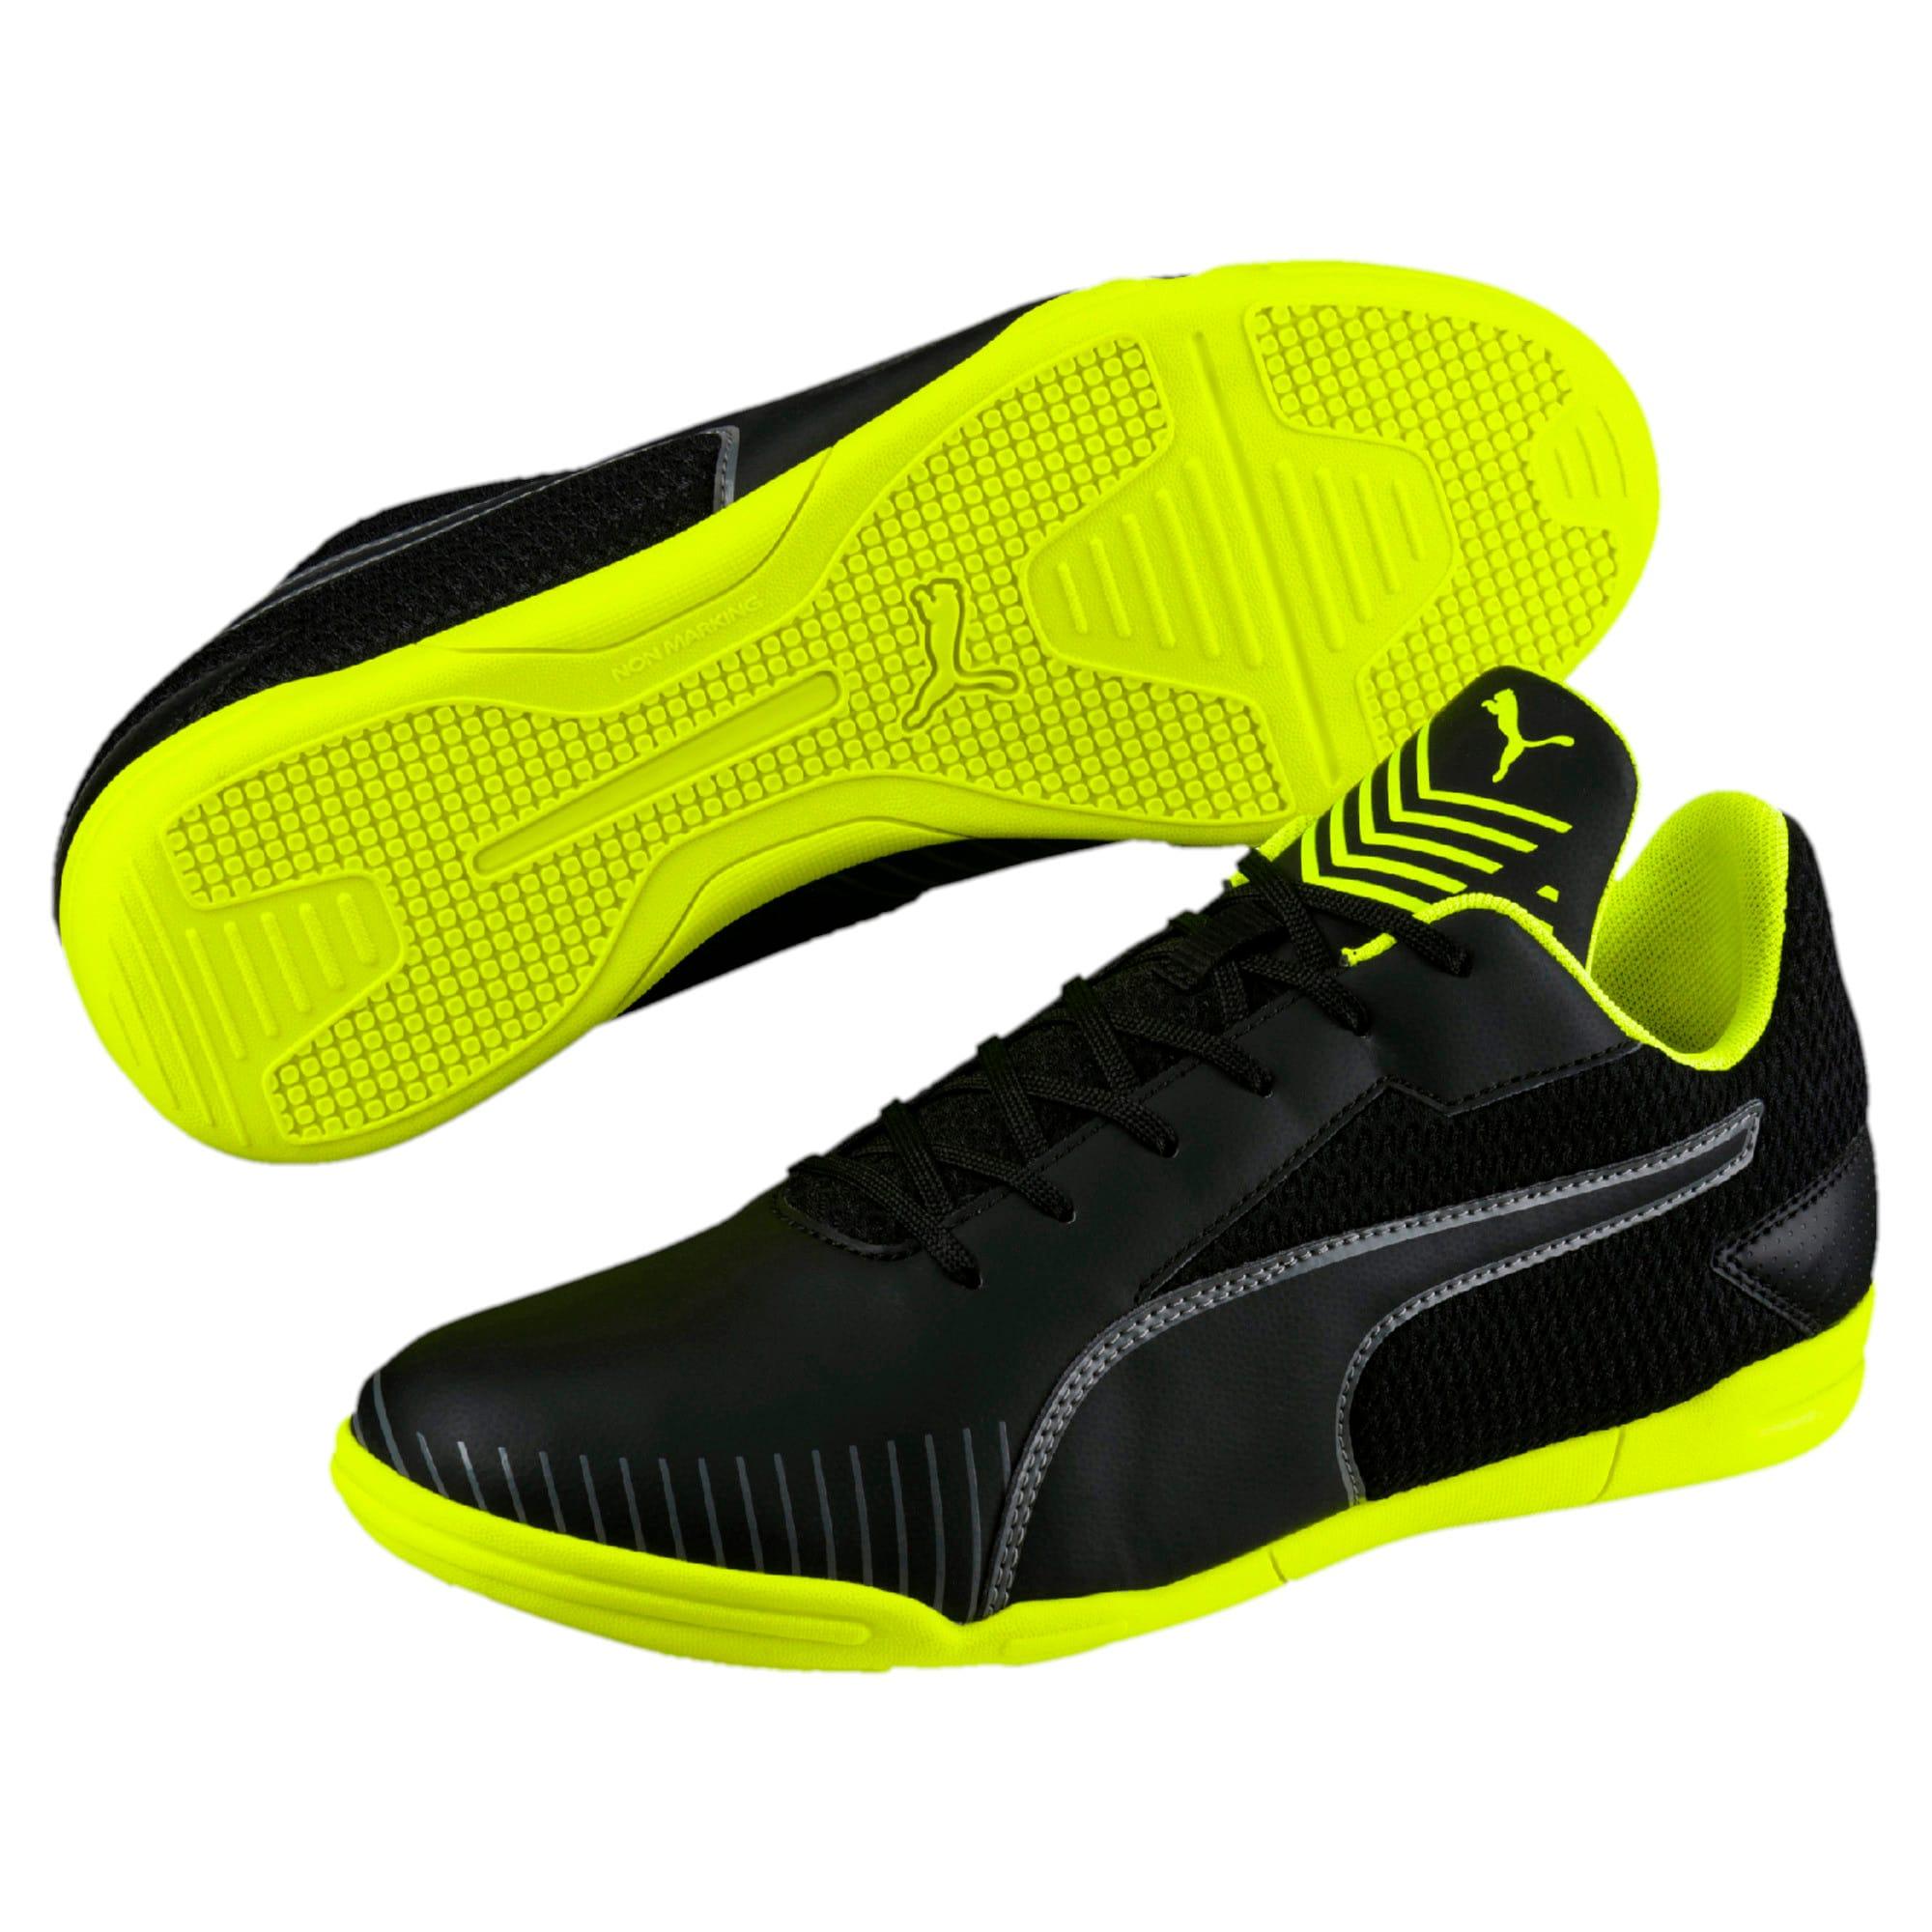 Thumbnail 6 of 365 CT Men's Court Football Shoes, Black-Black-Yellow-White, medium-IND